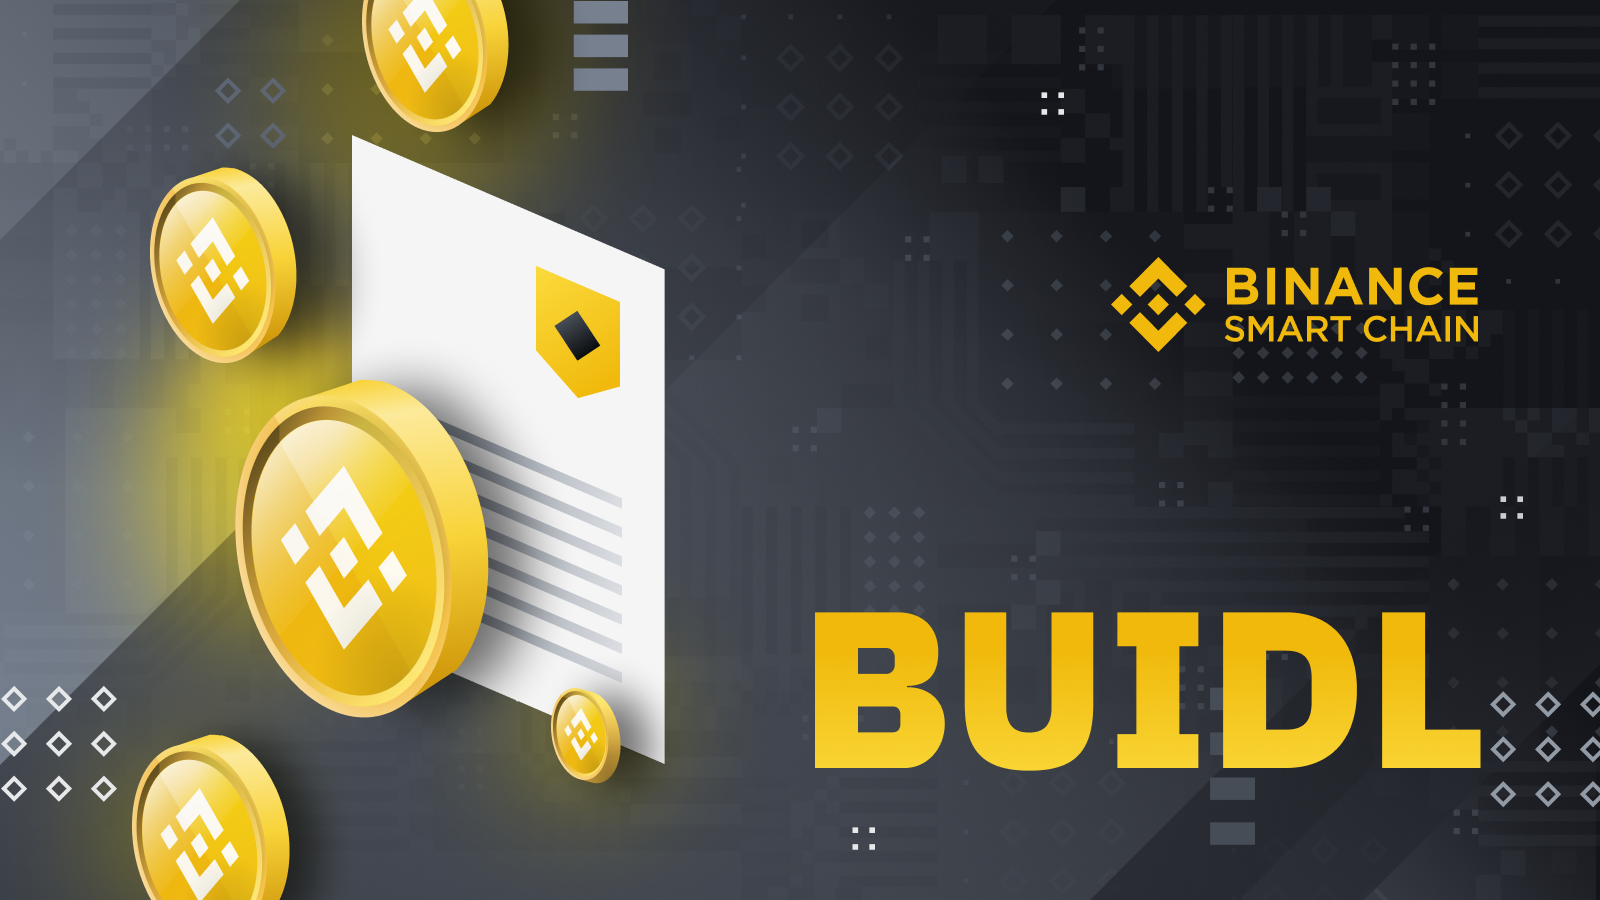 BUIDL Reward Program Updates with $550k USD Distributed as June Reward